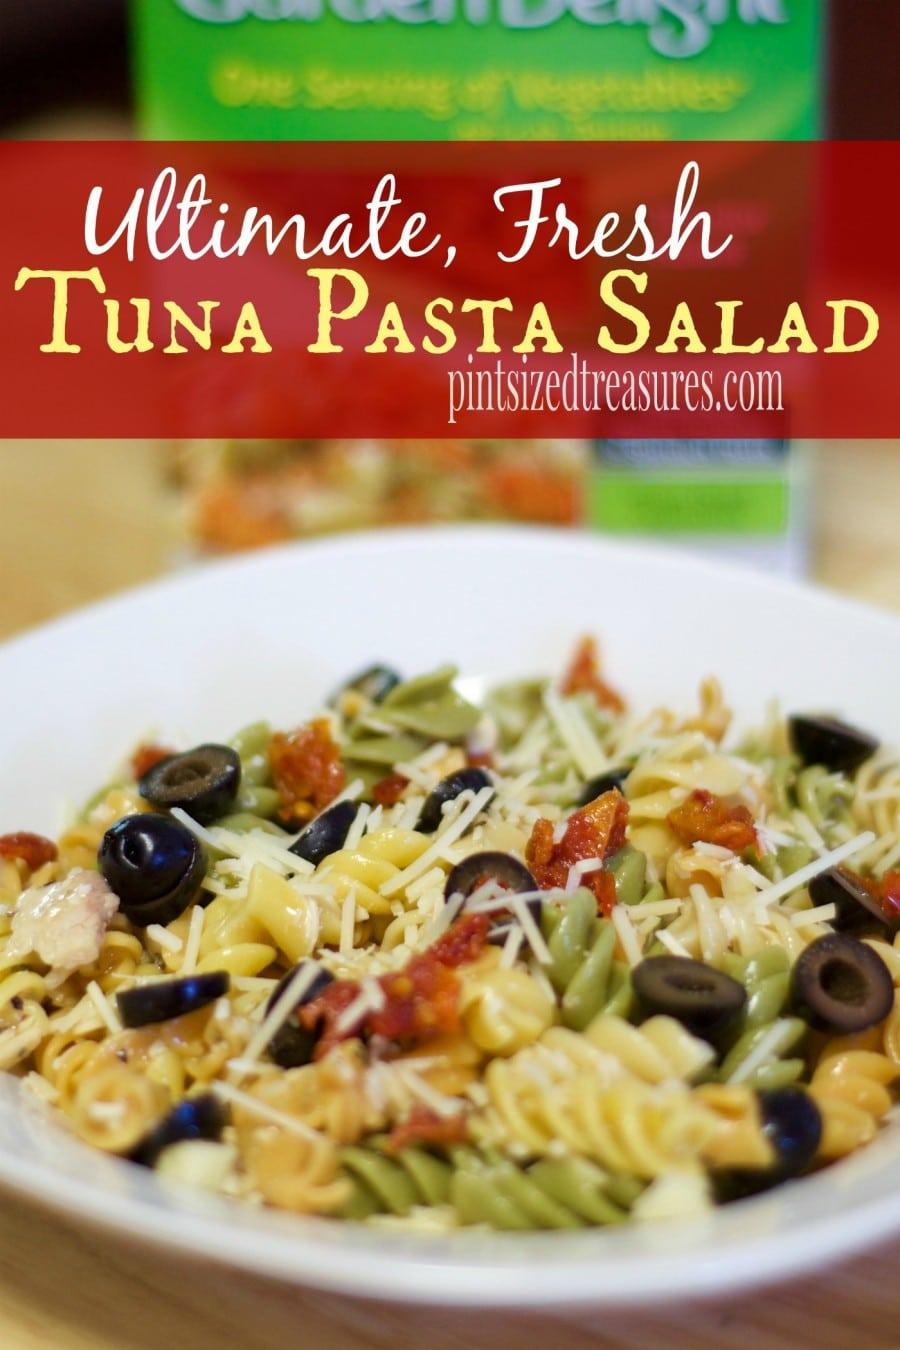 Recipes for fresh tuna and pasta